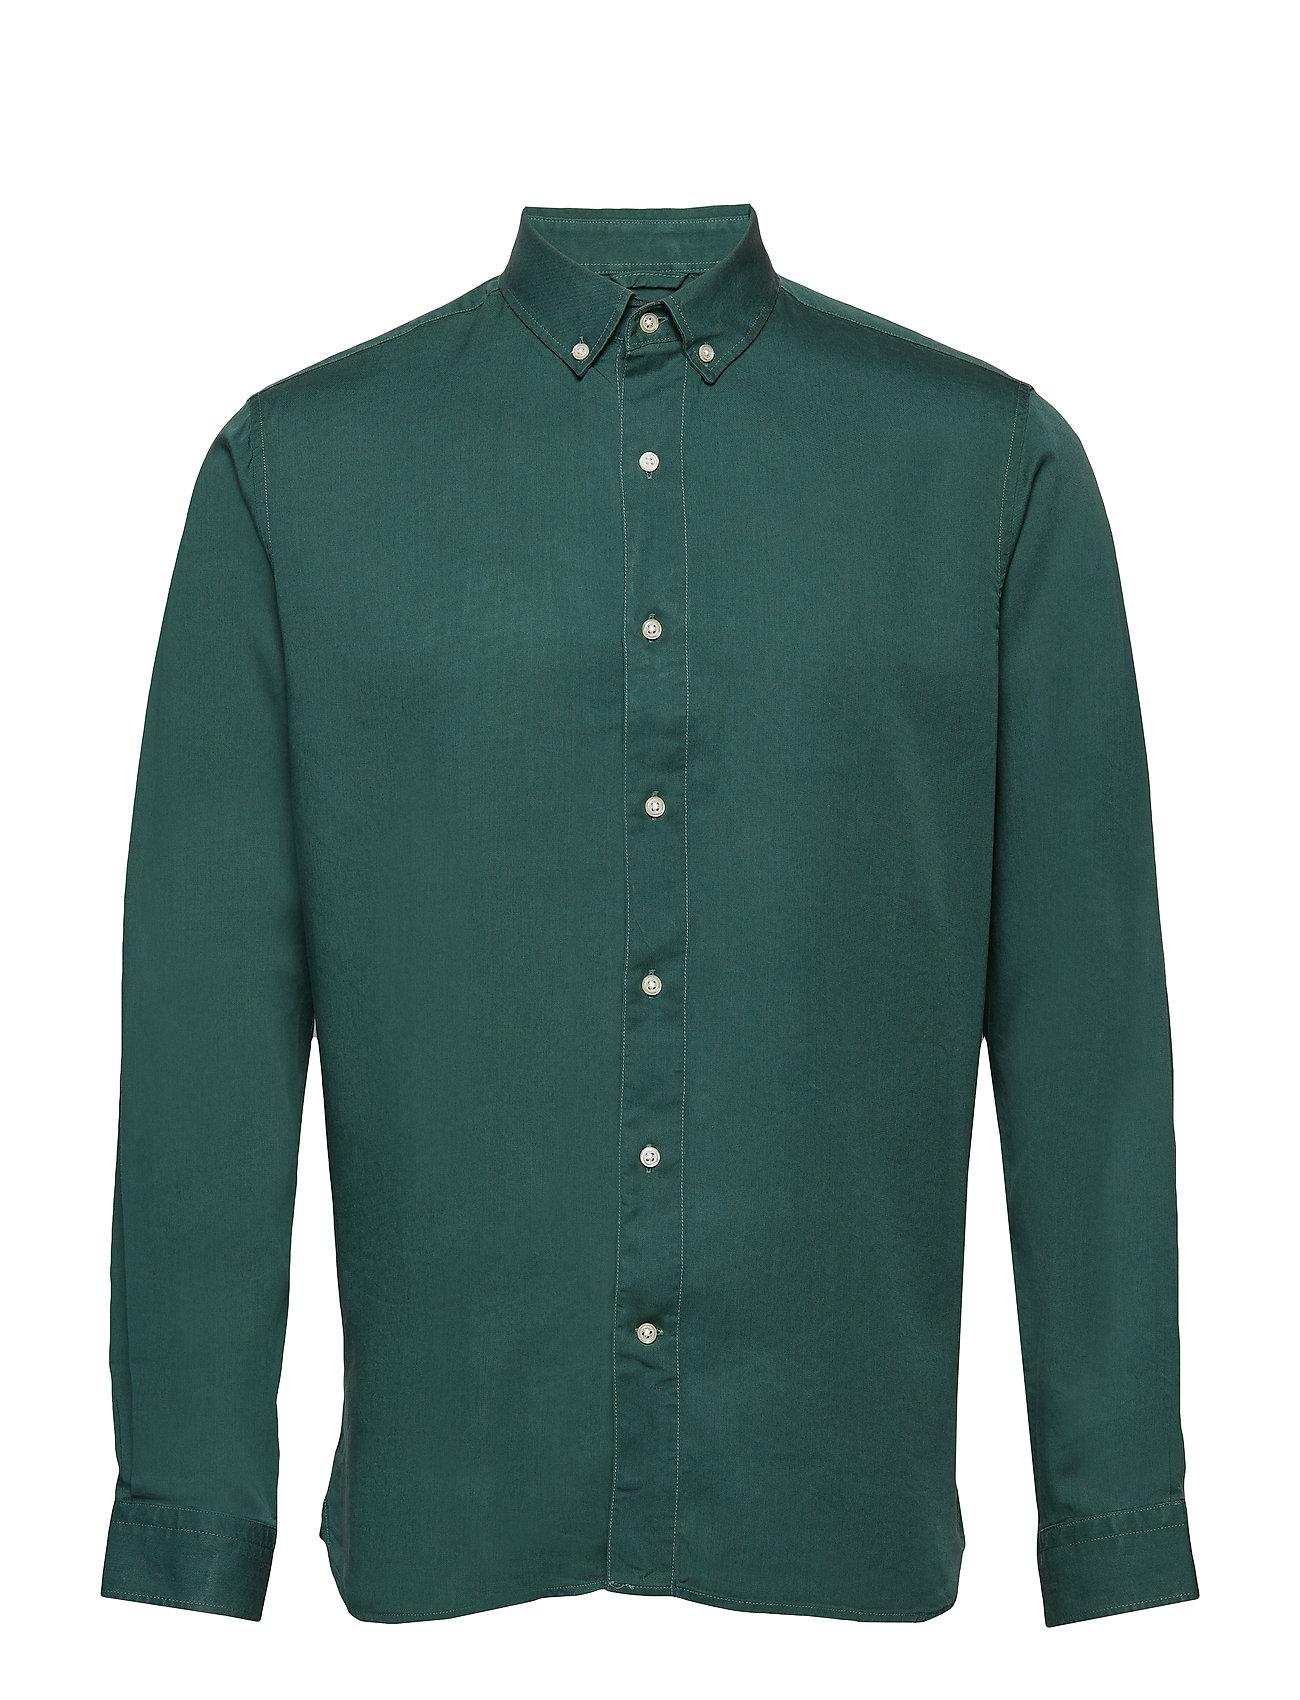 Knowledge Cotton Apparel Tencel shirt/Vegan - BISTRO GREEN